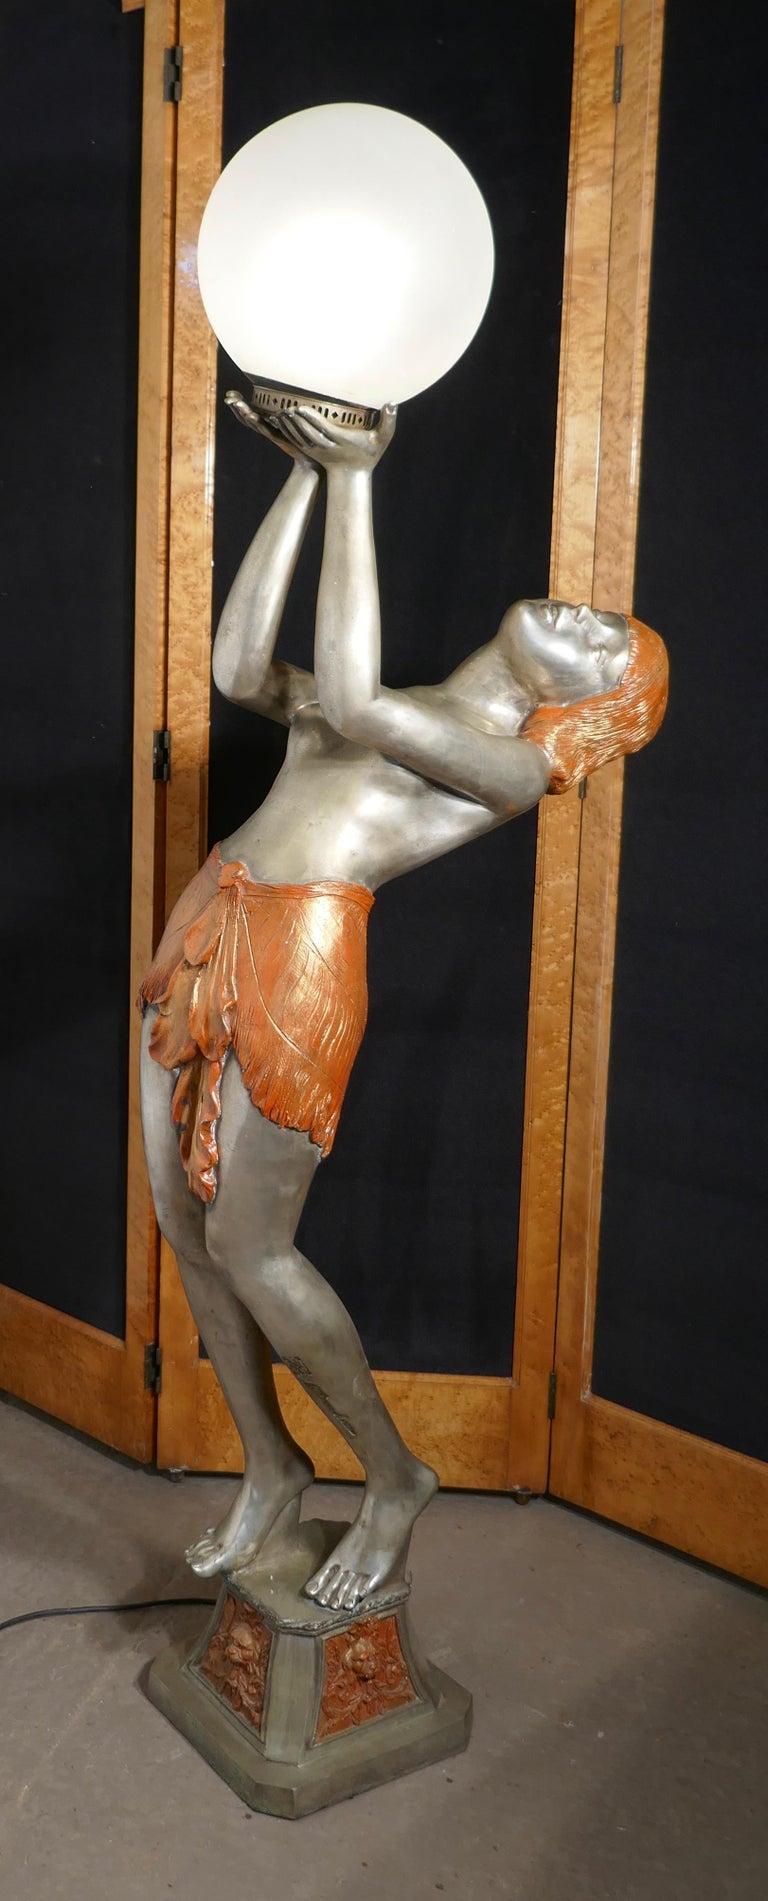 Large Art Deco Female Sculpture Floor Lamp, after Auguste Moreau Signed For Sale 1